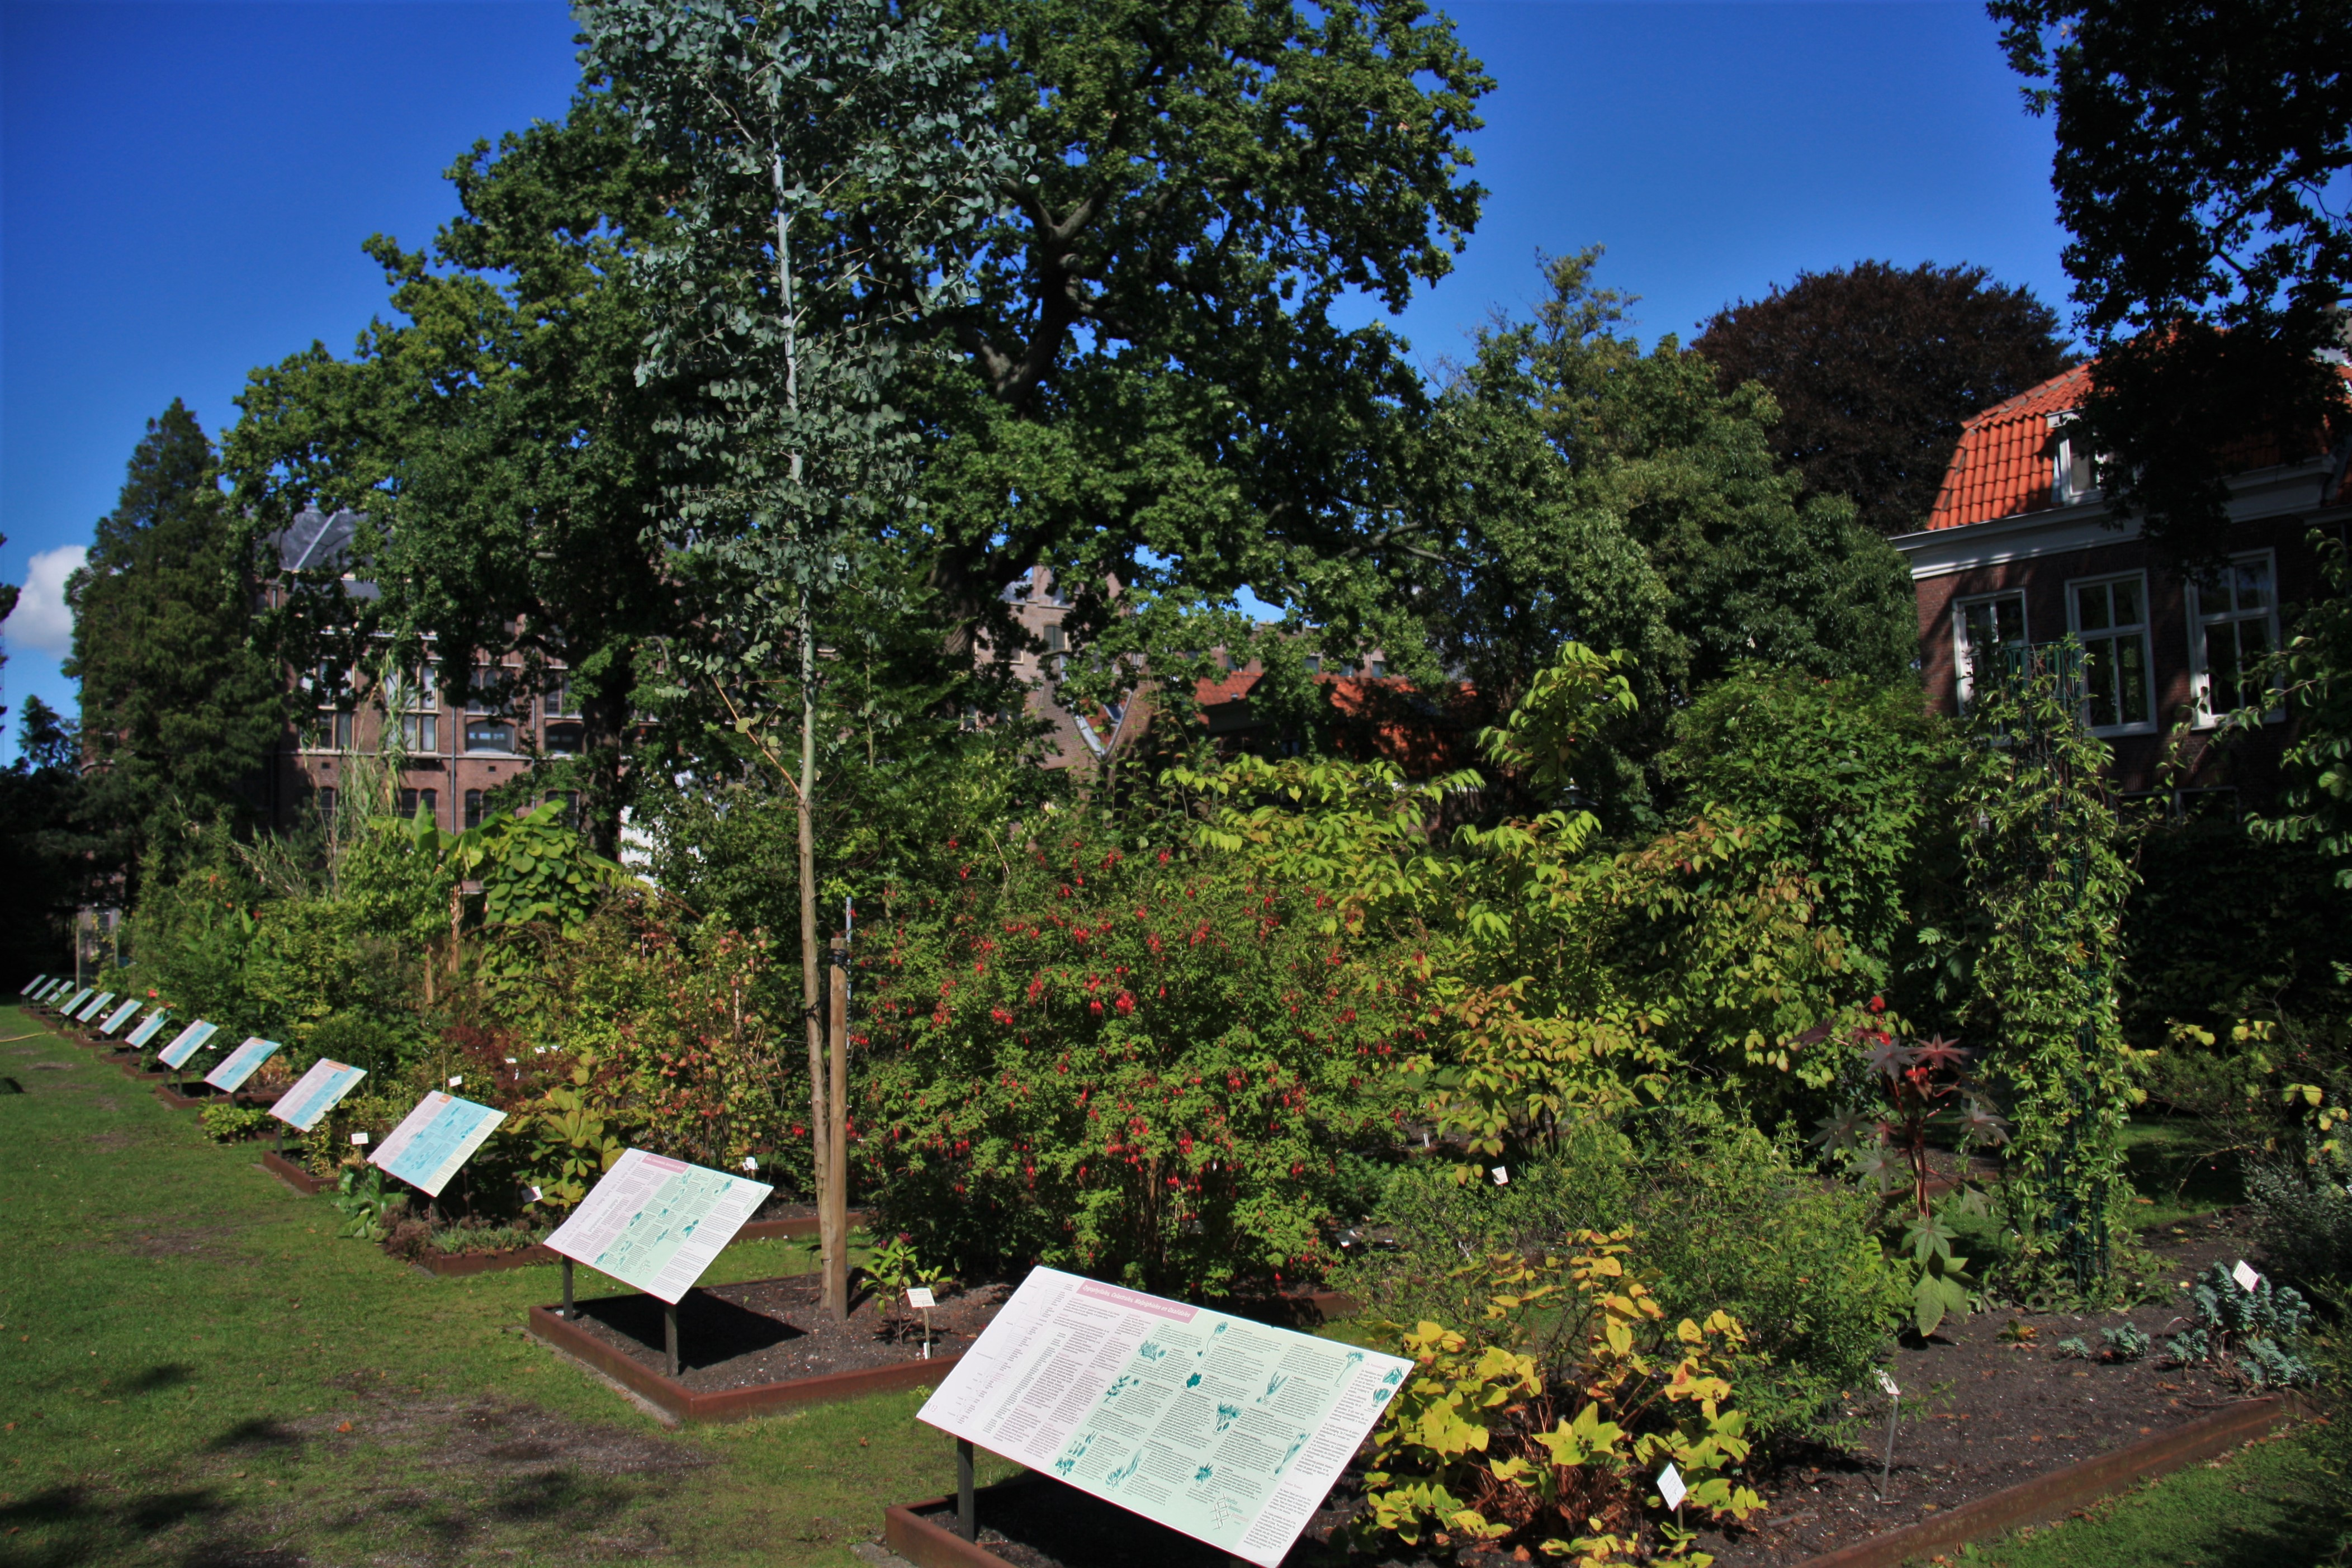 Botanische Tuin Leiden : Файл hortus botanicus leiden systematic garden g u Вікіпедія